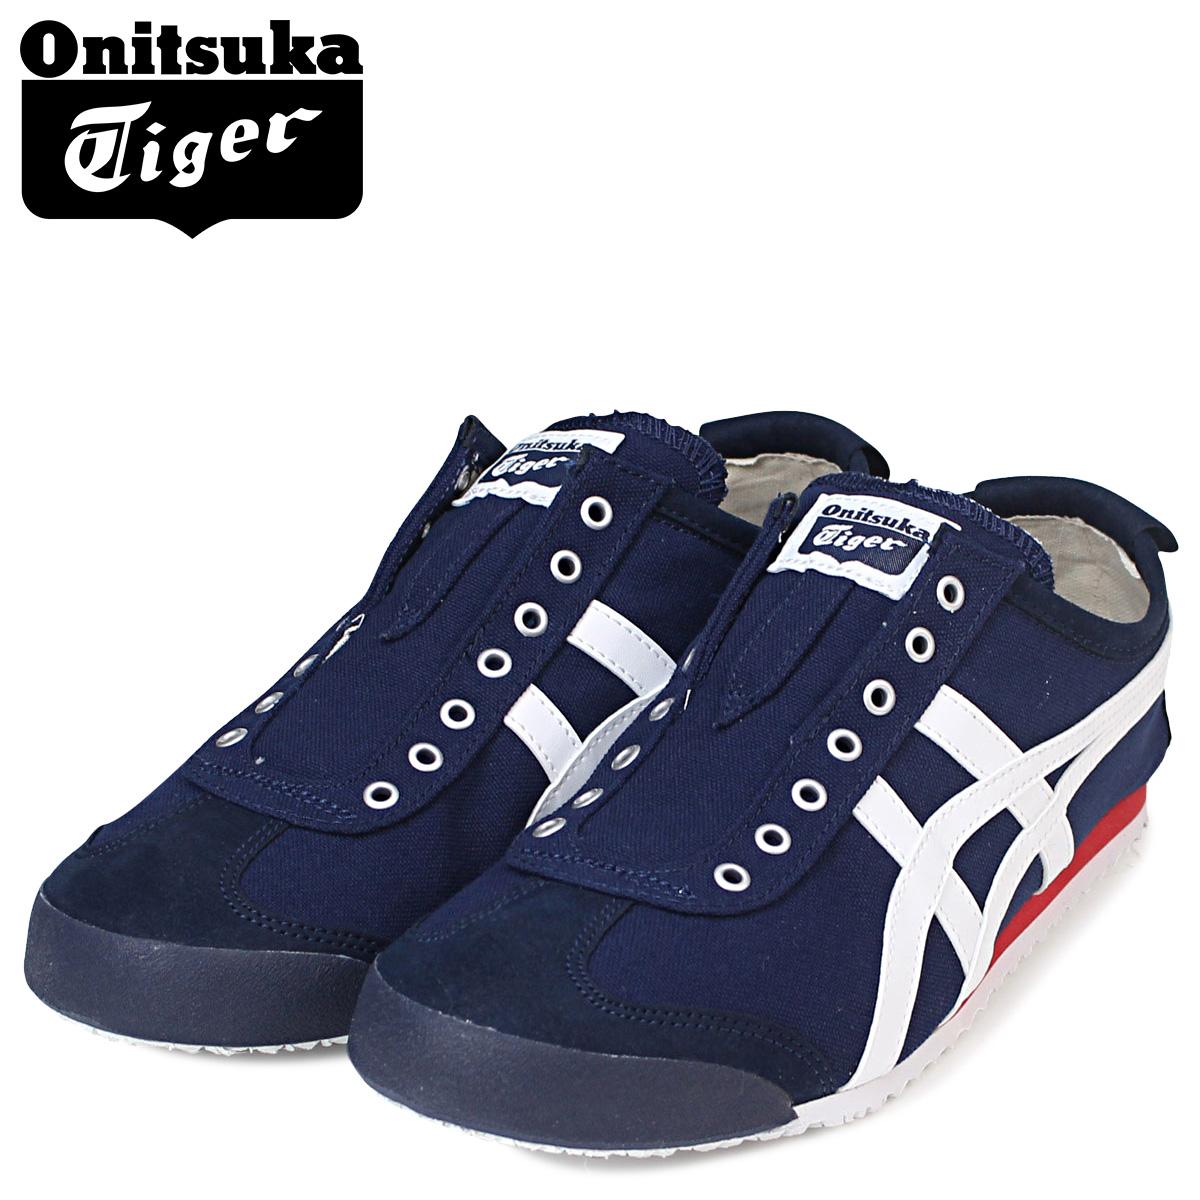 asics tiger shoes online, OFF 77%,Buy!